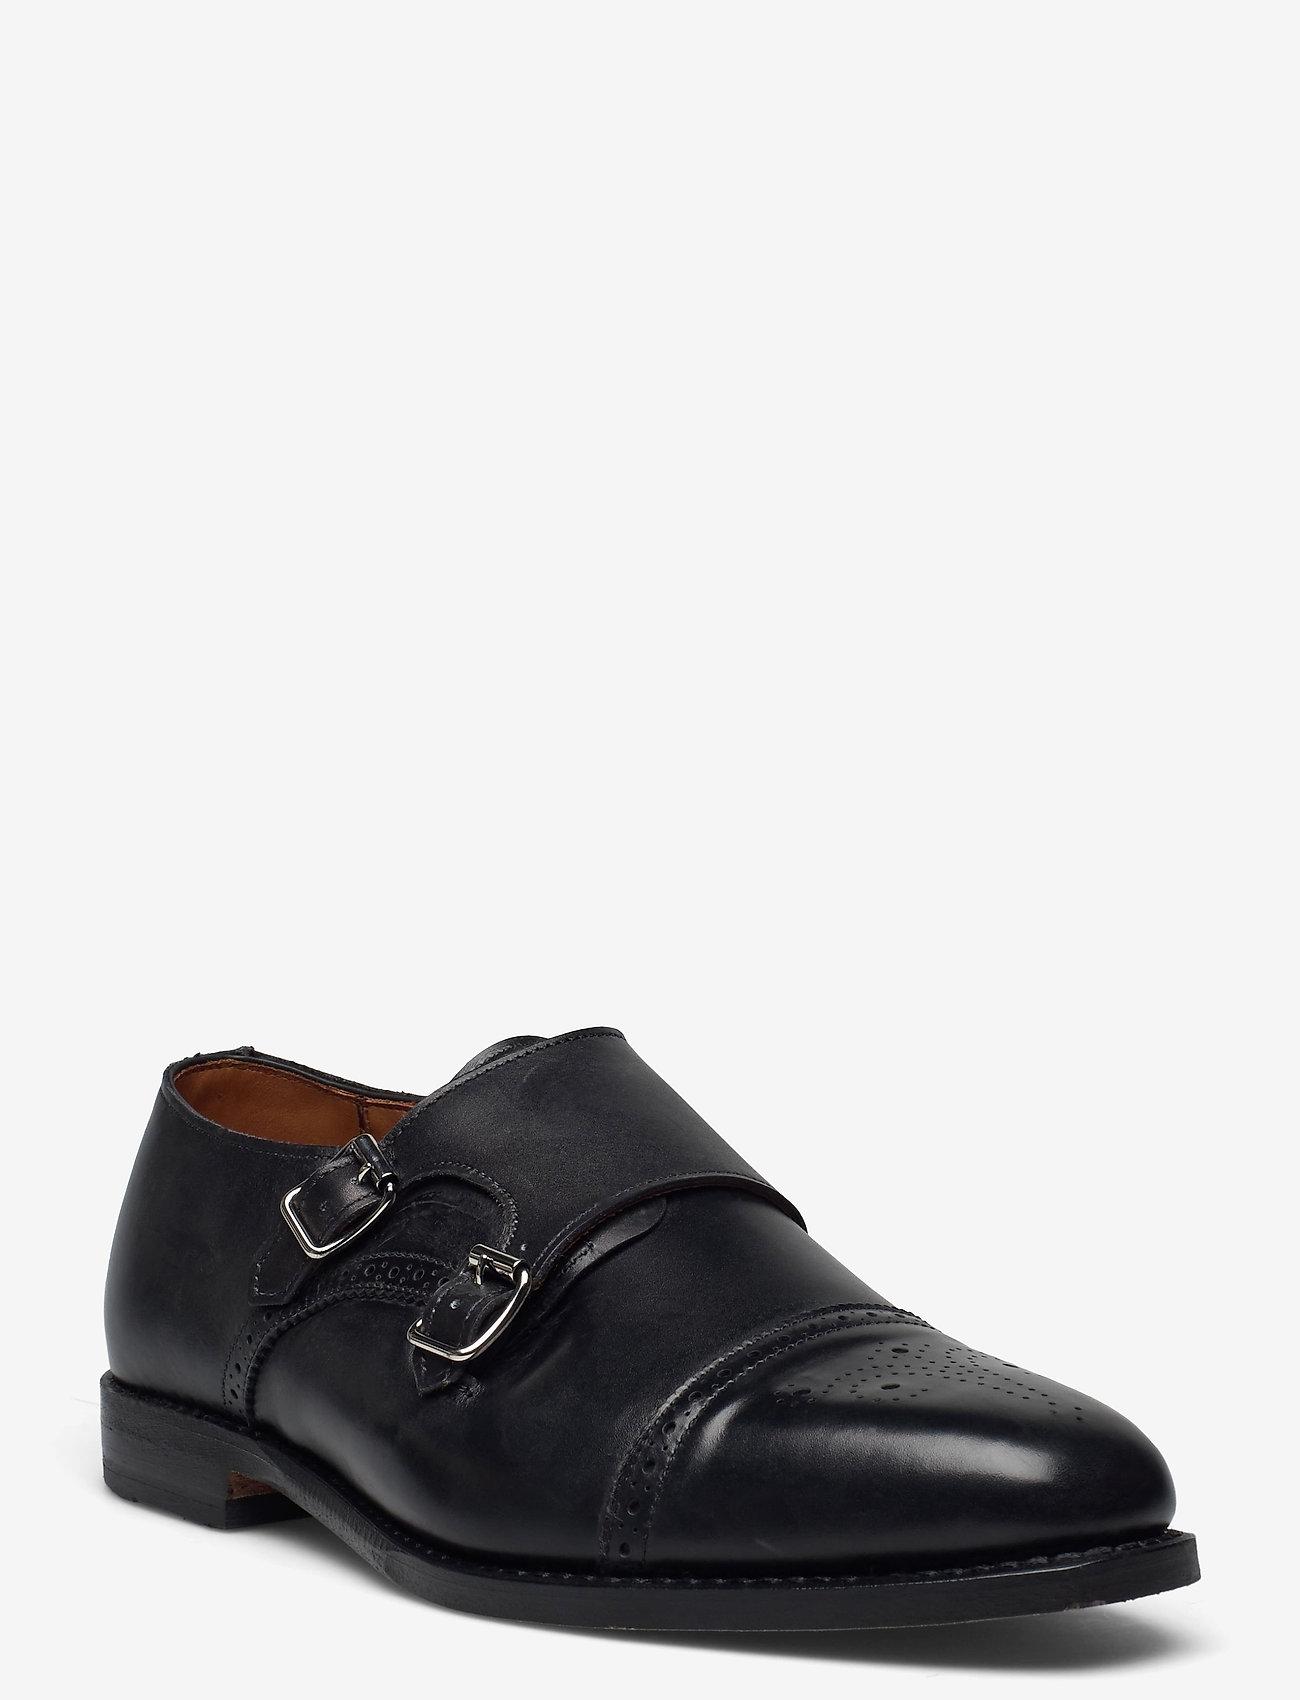 Allen Edmonds - St. John´s - business - black - 1